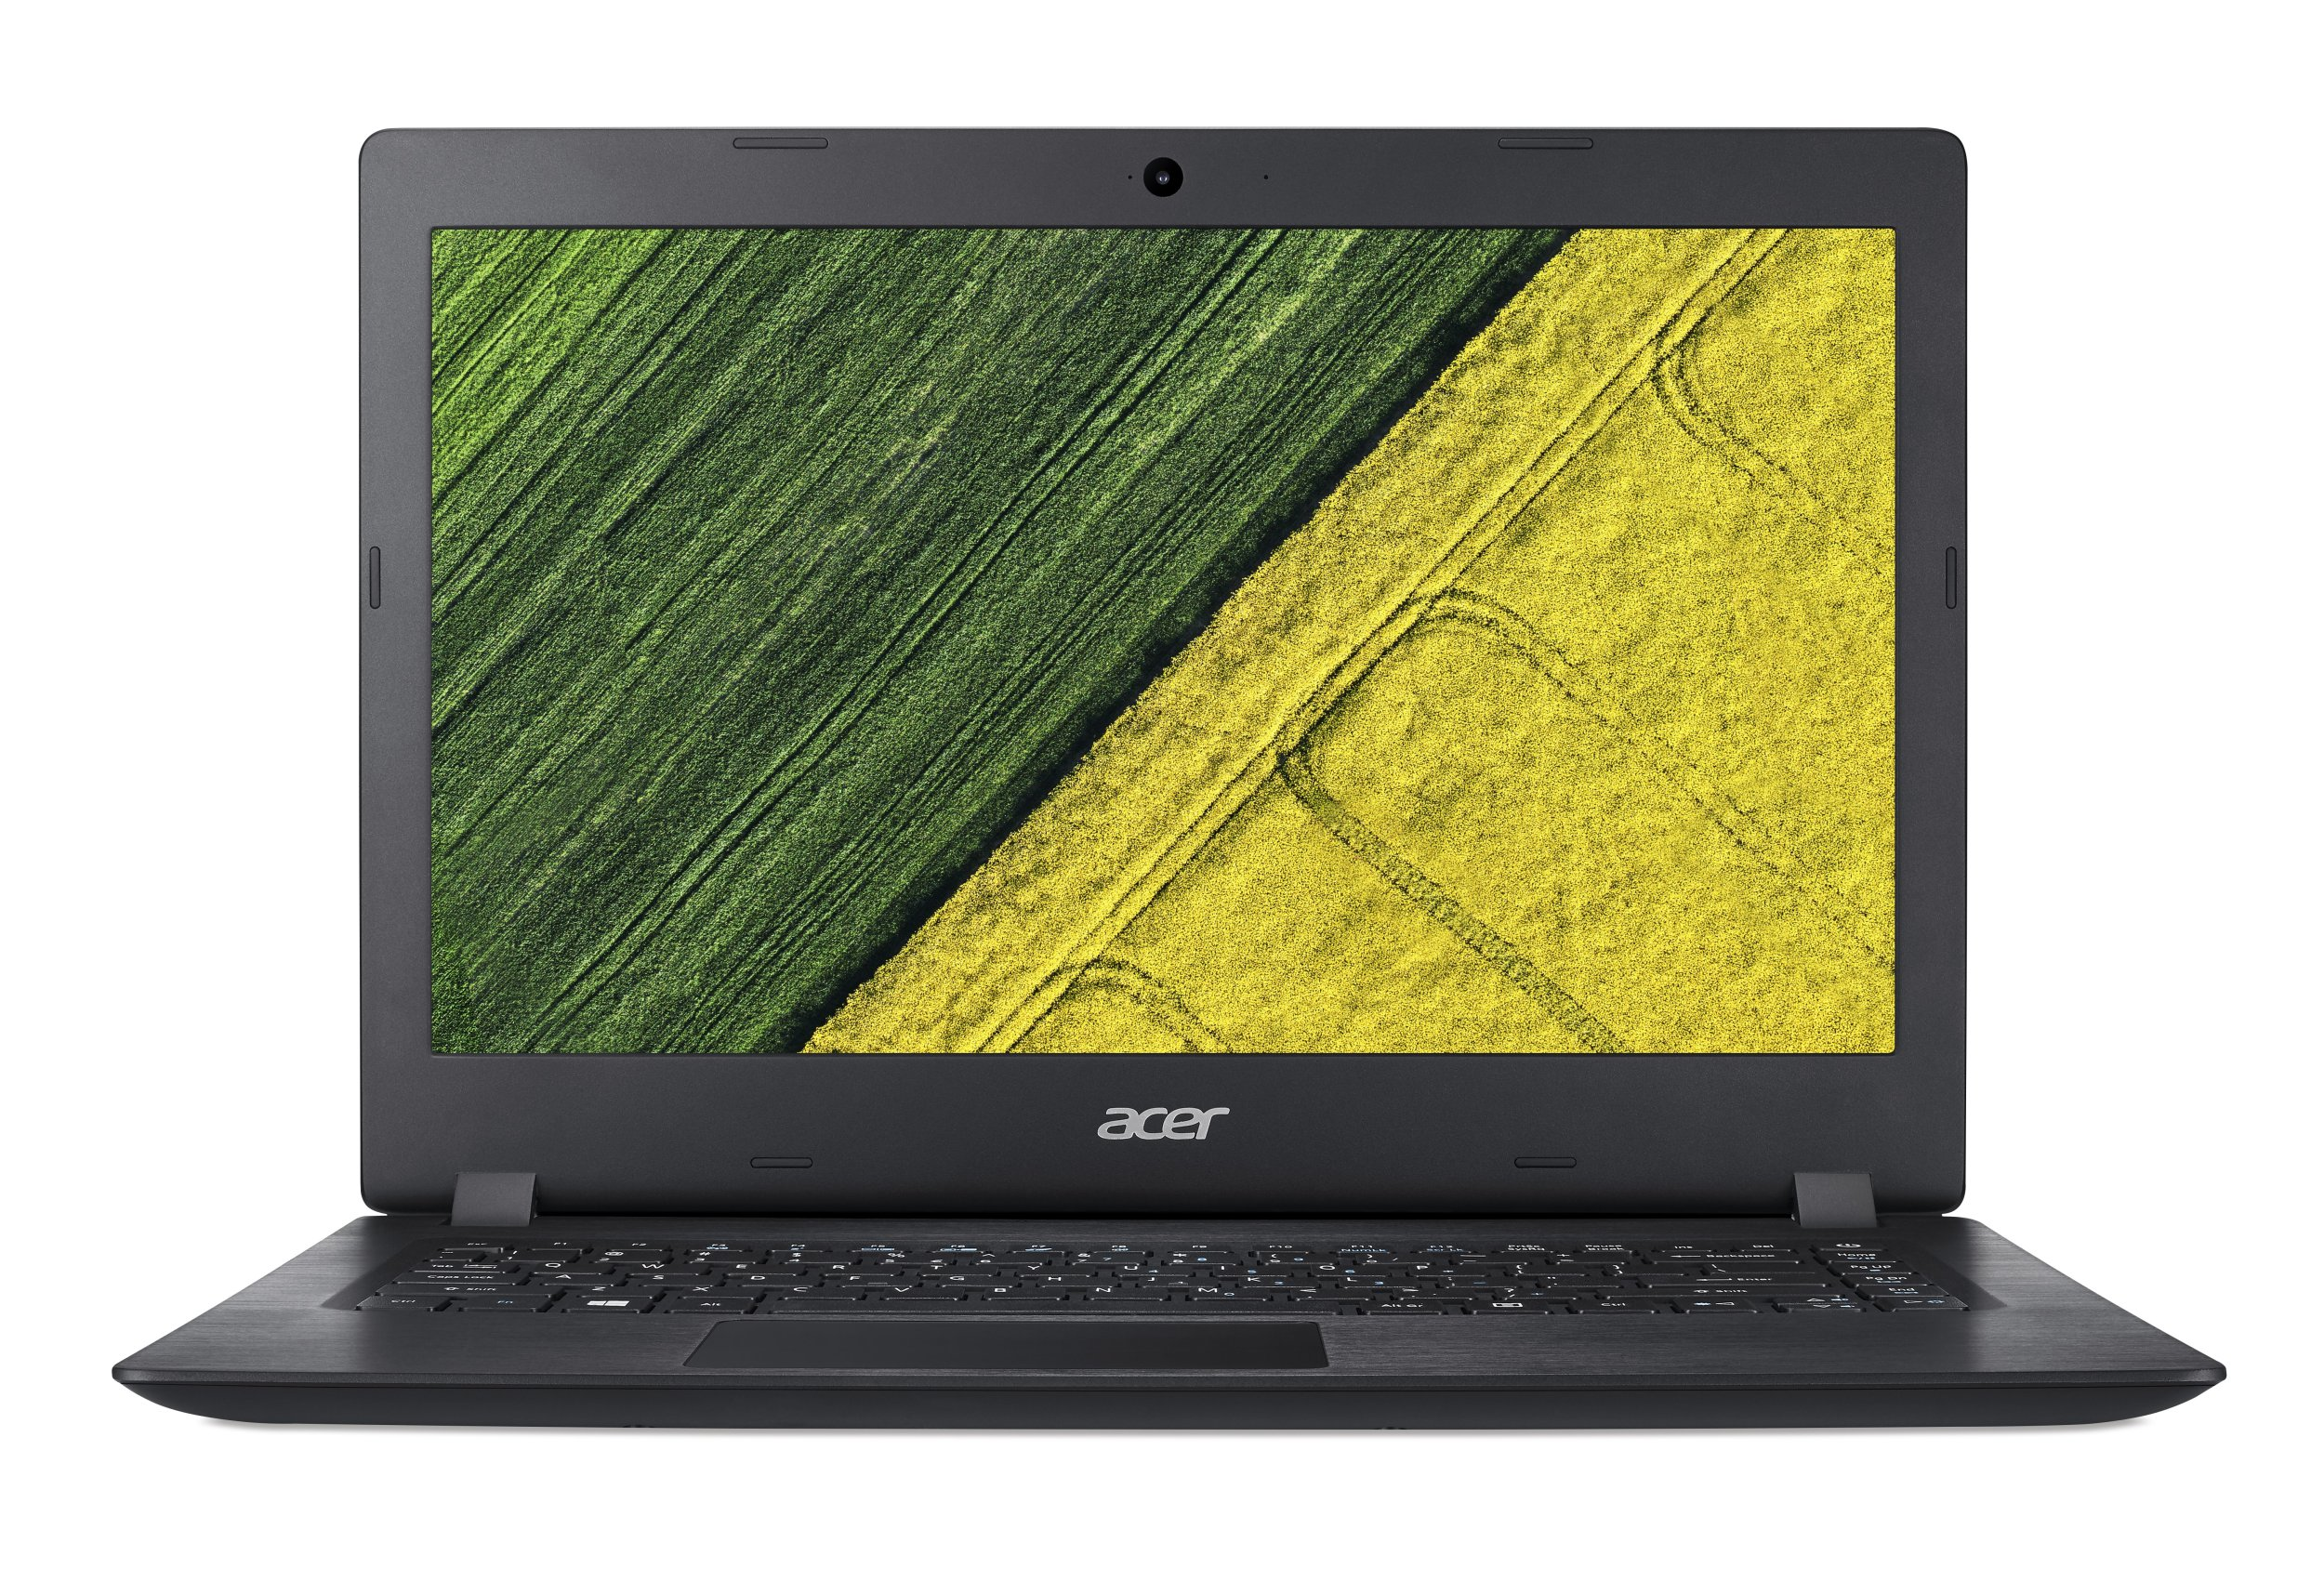 "Demoprodukt Acer Aspire 1 (A114-31-C813) Celeron N3350/4GB+N/A/64GB+N/A/HD Graphics/14"" HD/W10 Home/Black"